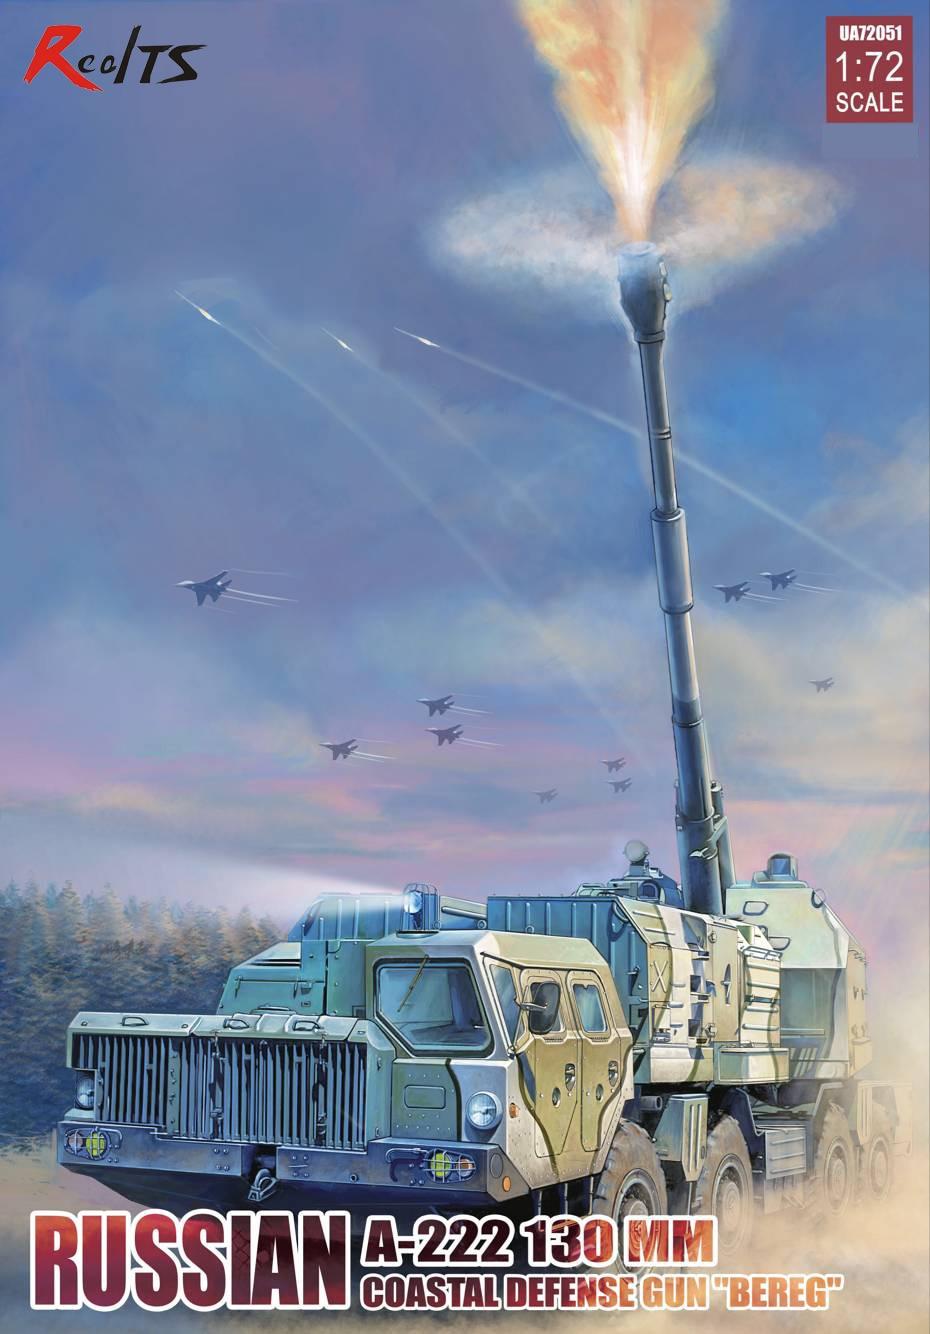 Realts modelcollect UA72051 1/72 ruso A-222 130mm defensa costera ...